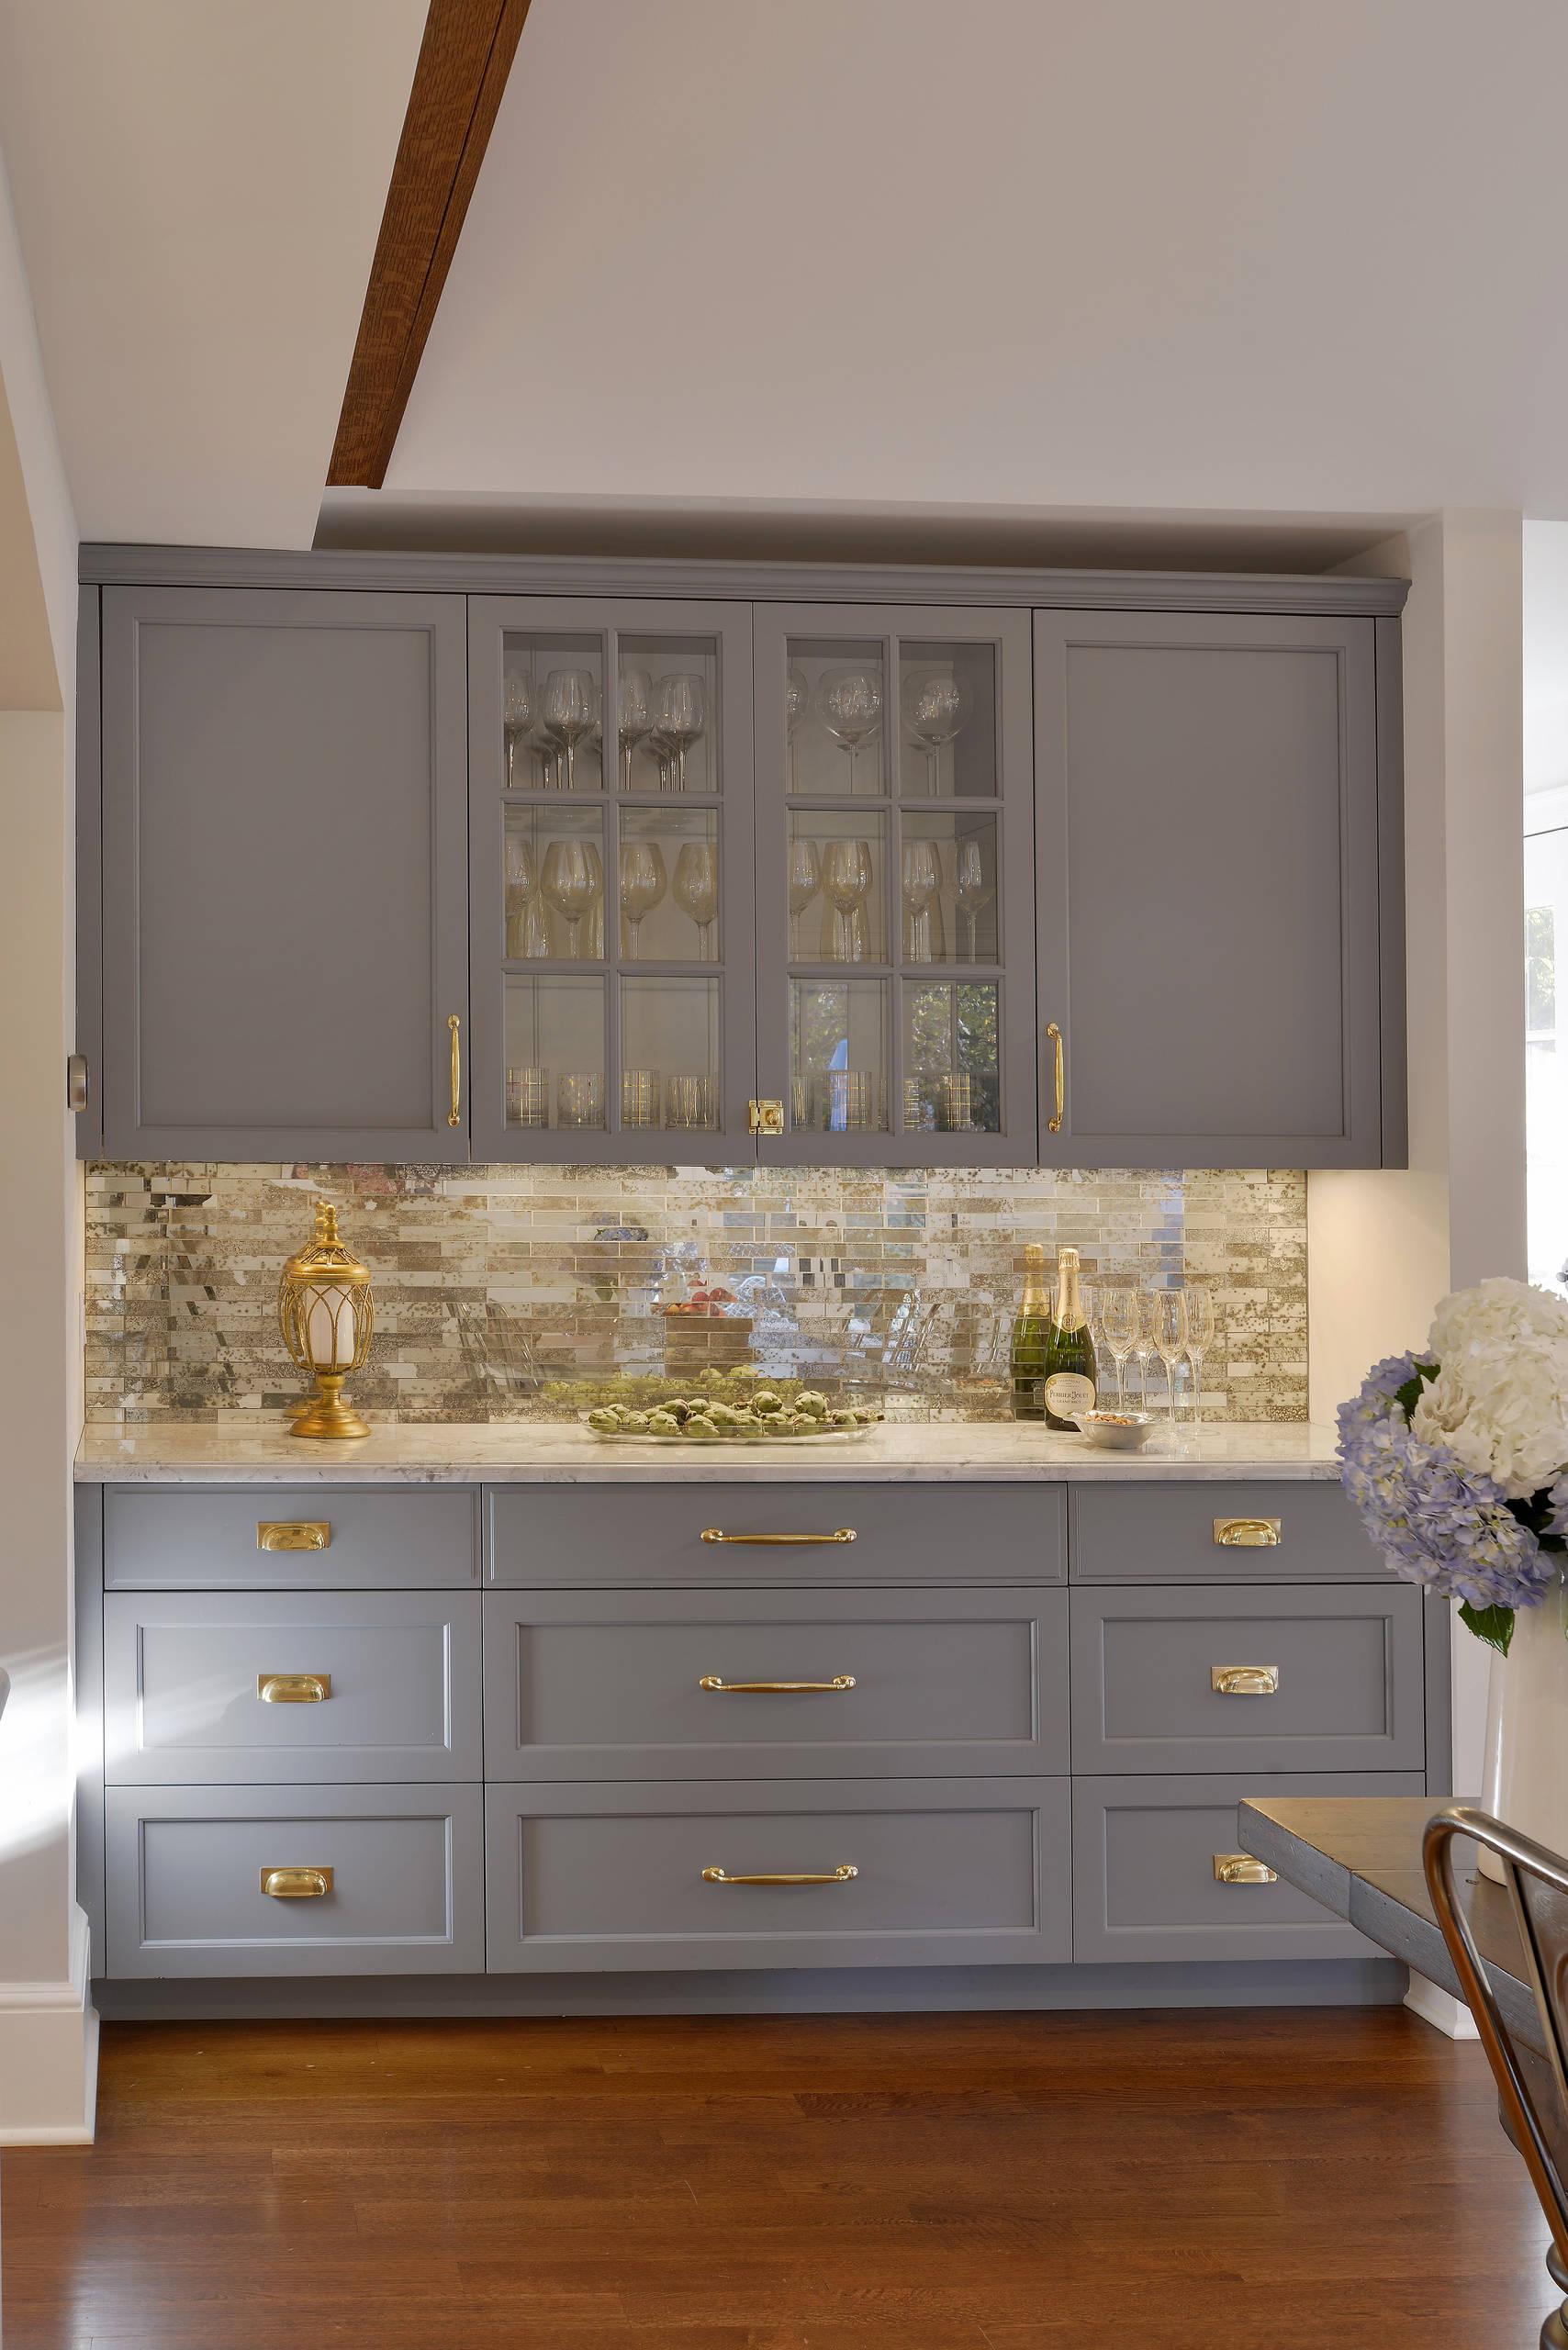 75 Beautiful Kitchen With Mirror Backsplash Pictures Ideas July 2021 Houzz